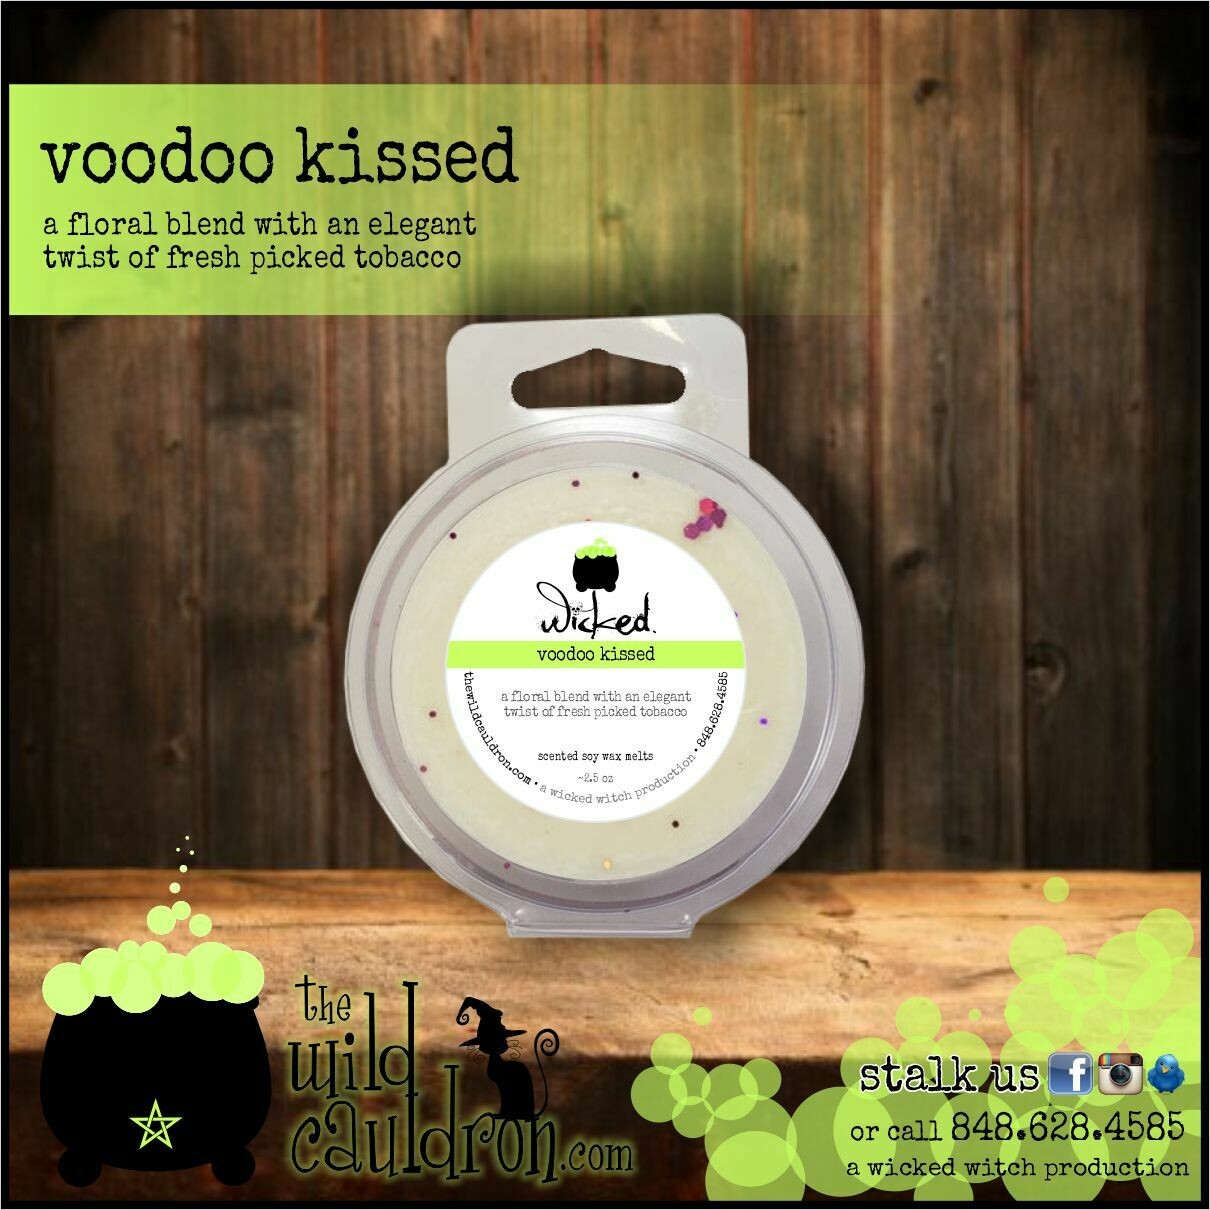 Voodoo Kissed Wicked Wax Melts